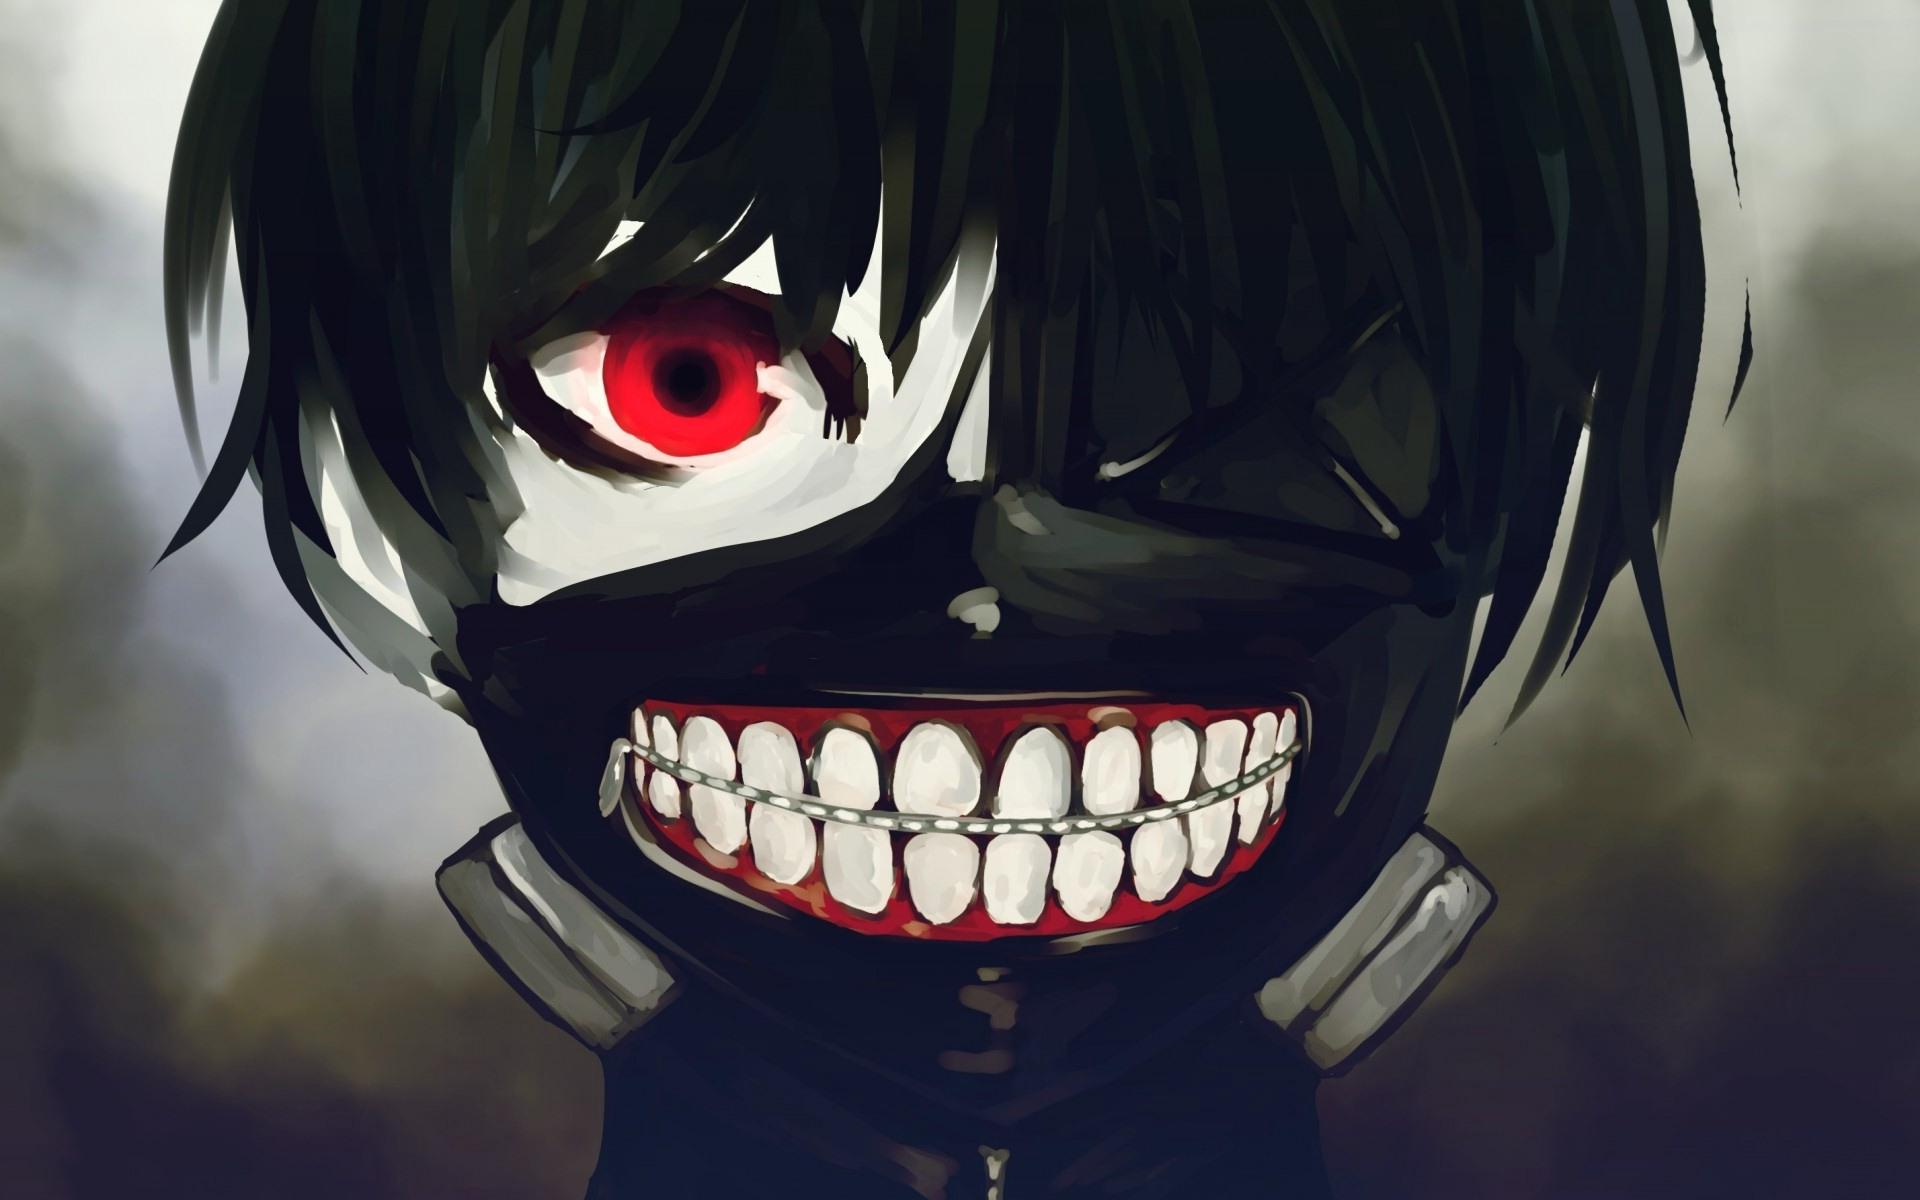 Cute Anime Boy Wallpapers Download Cute Anime Boy ...